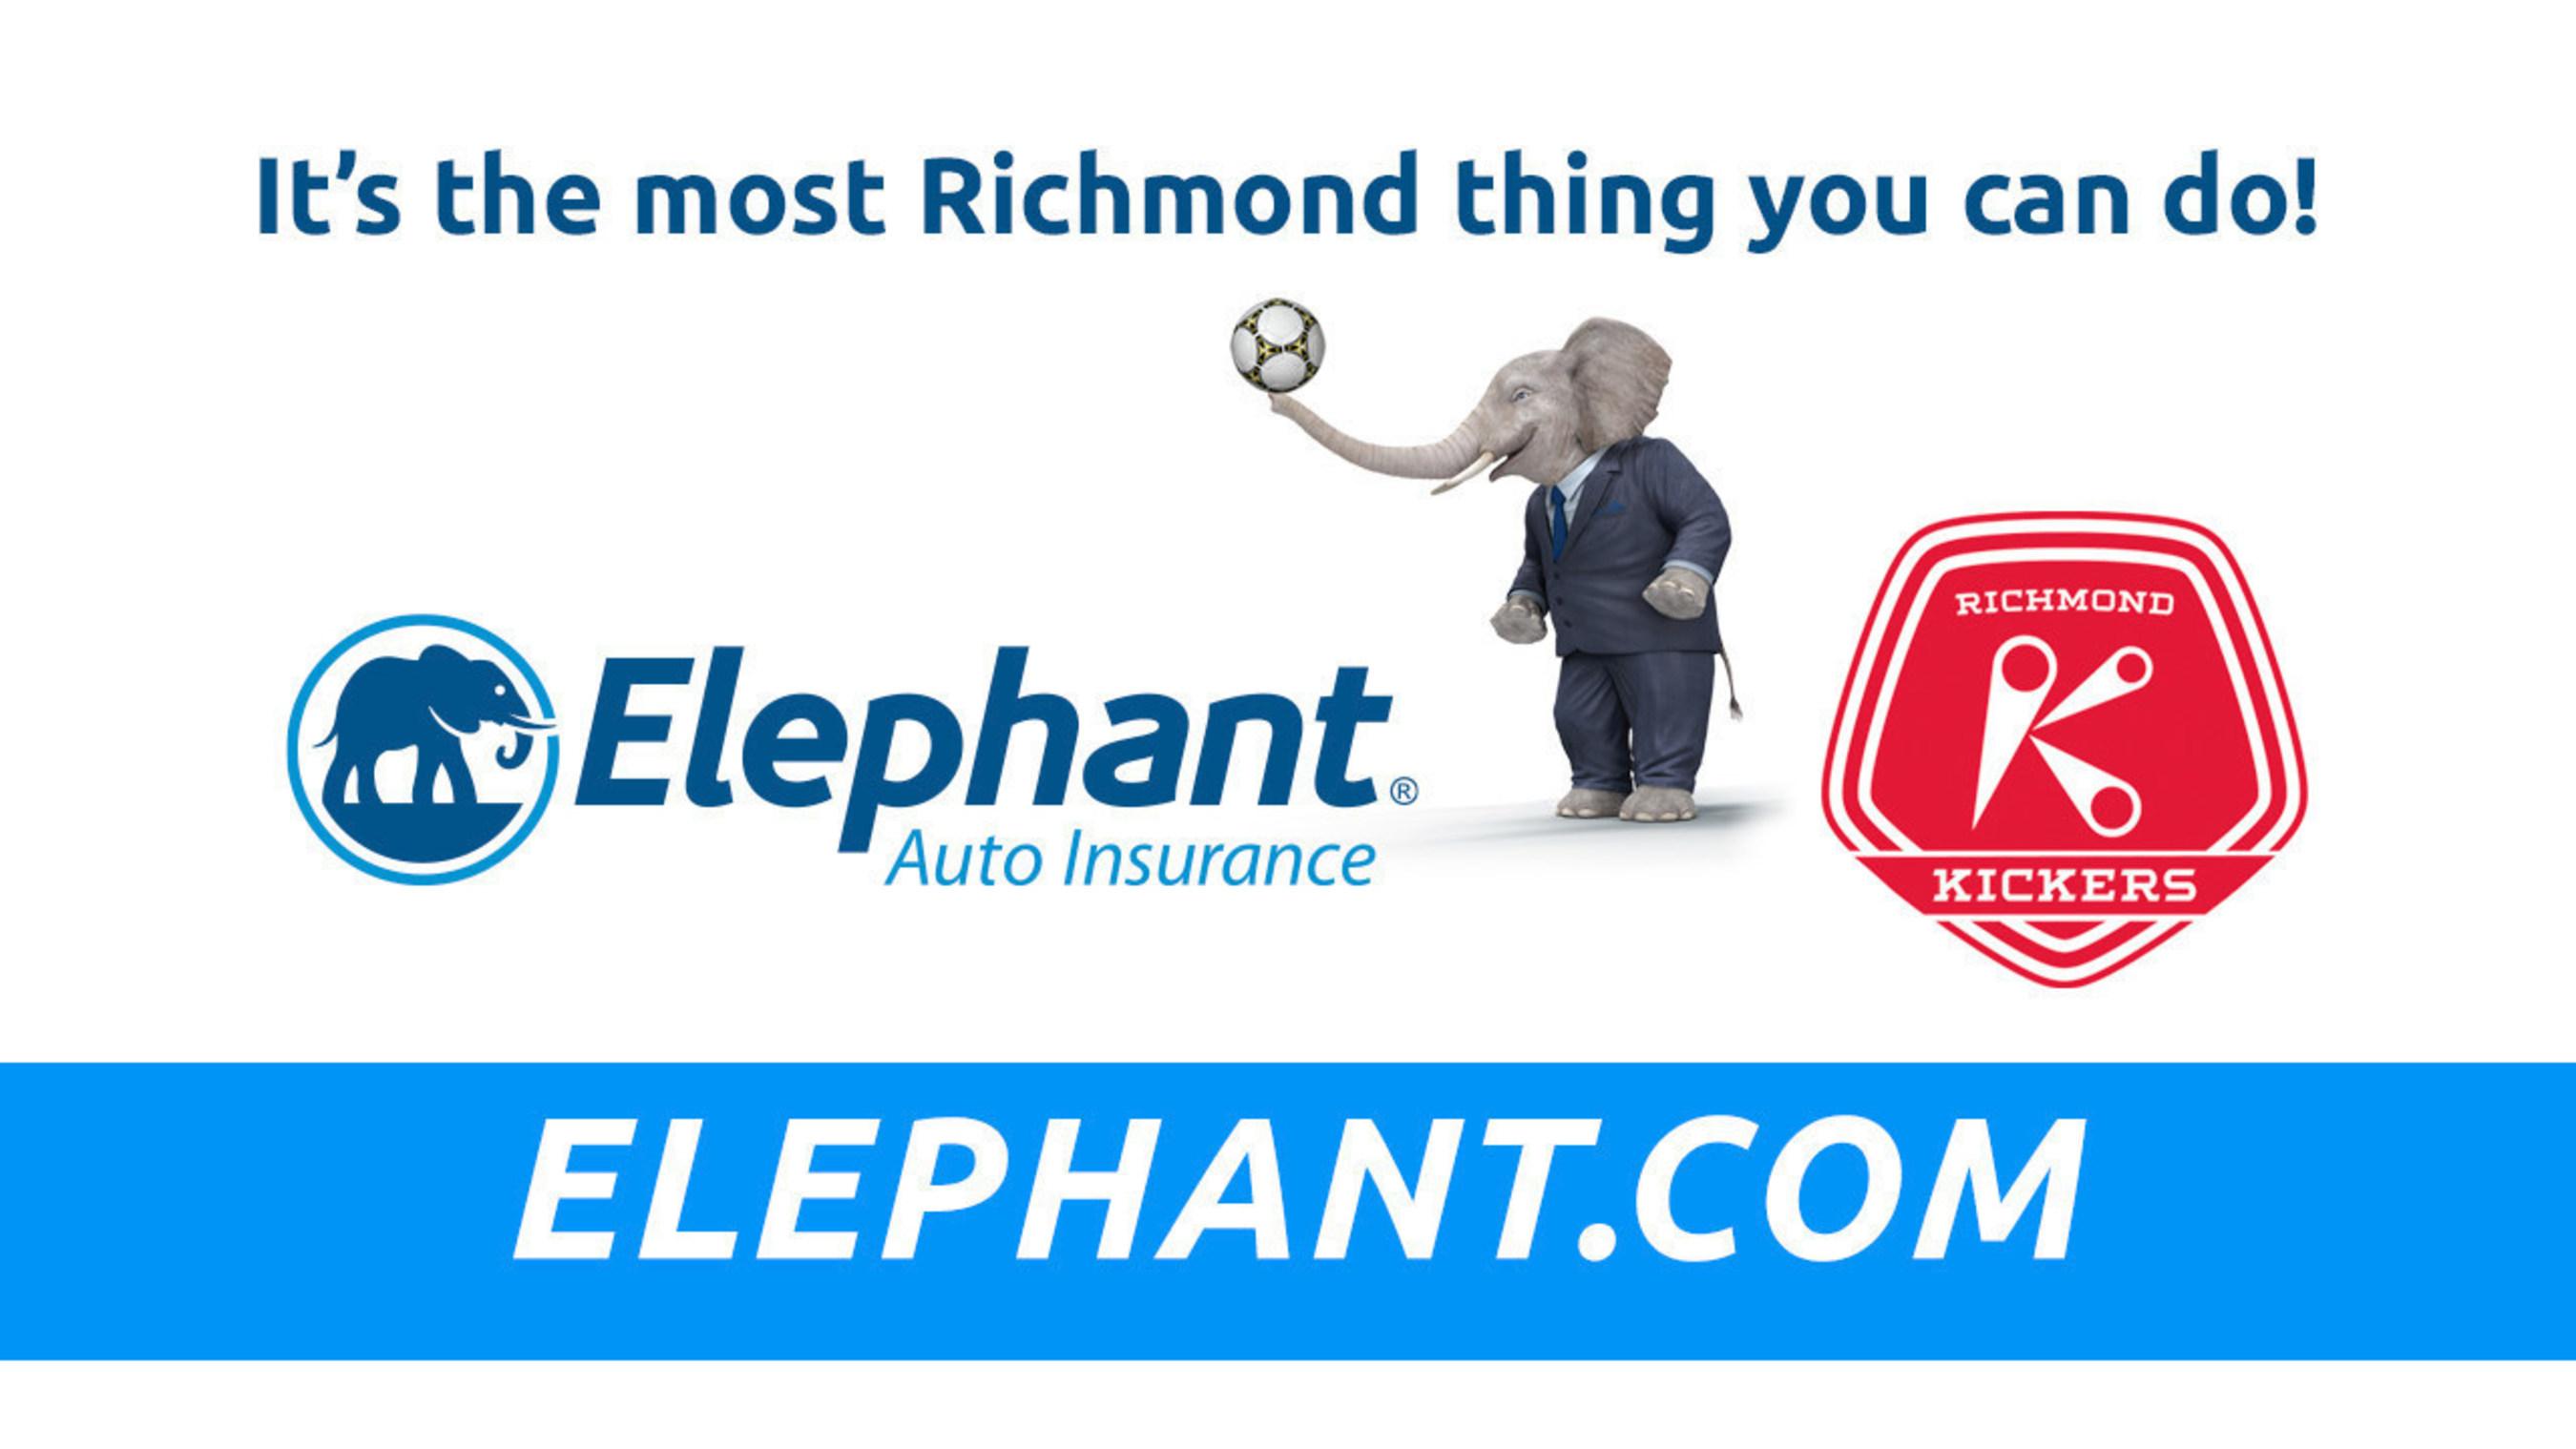 Elephant Auto Insurance partners with the Richmond Kickers